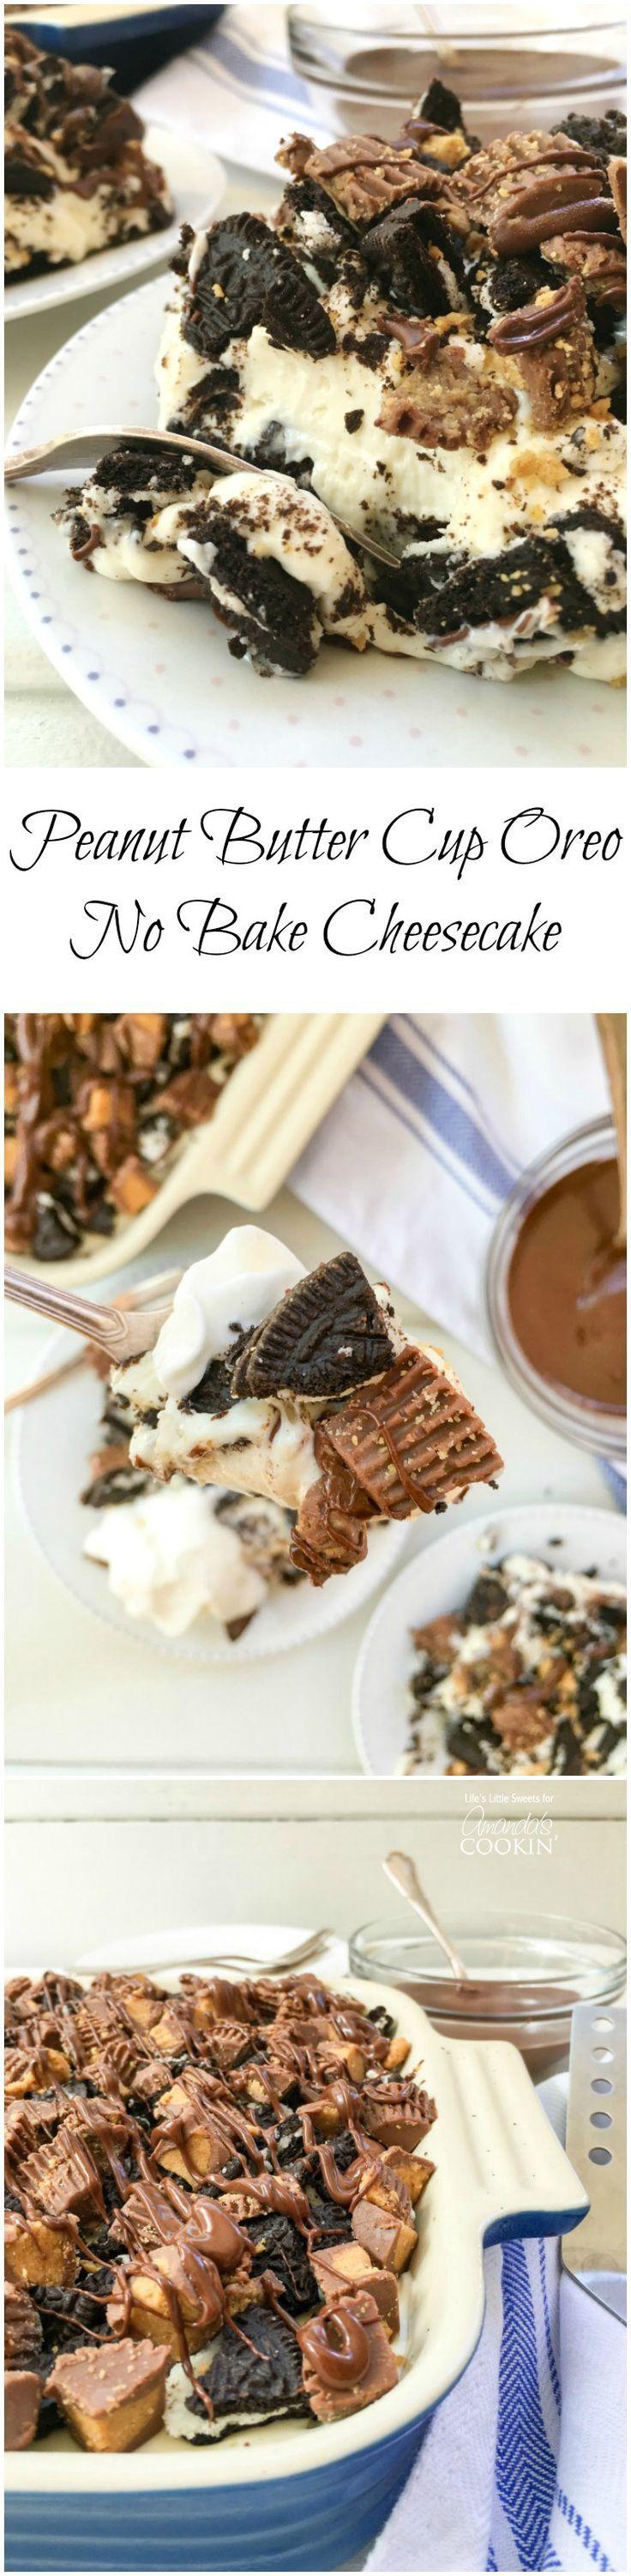 Peanut Butter Oreo No Bake Cheesecake combines cheesecake w/ Oreo cookies &…